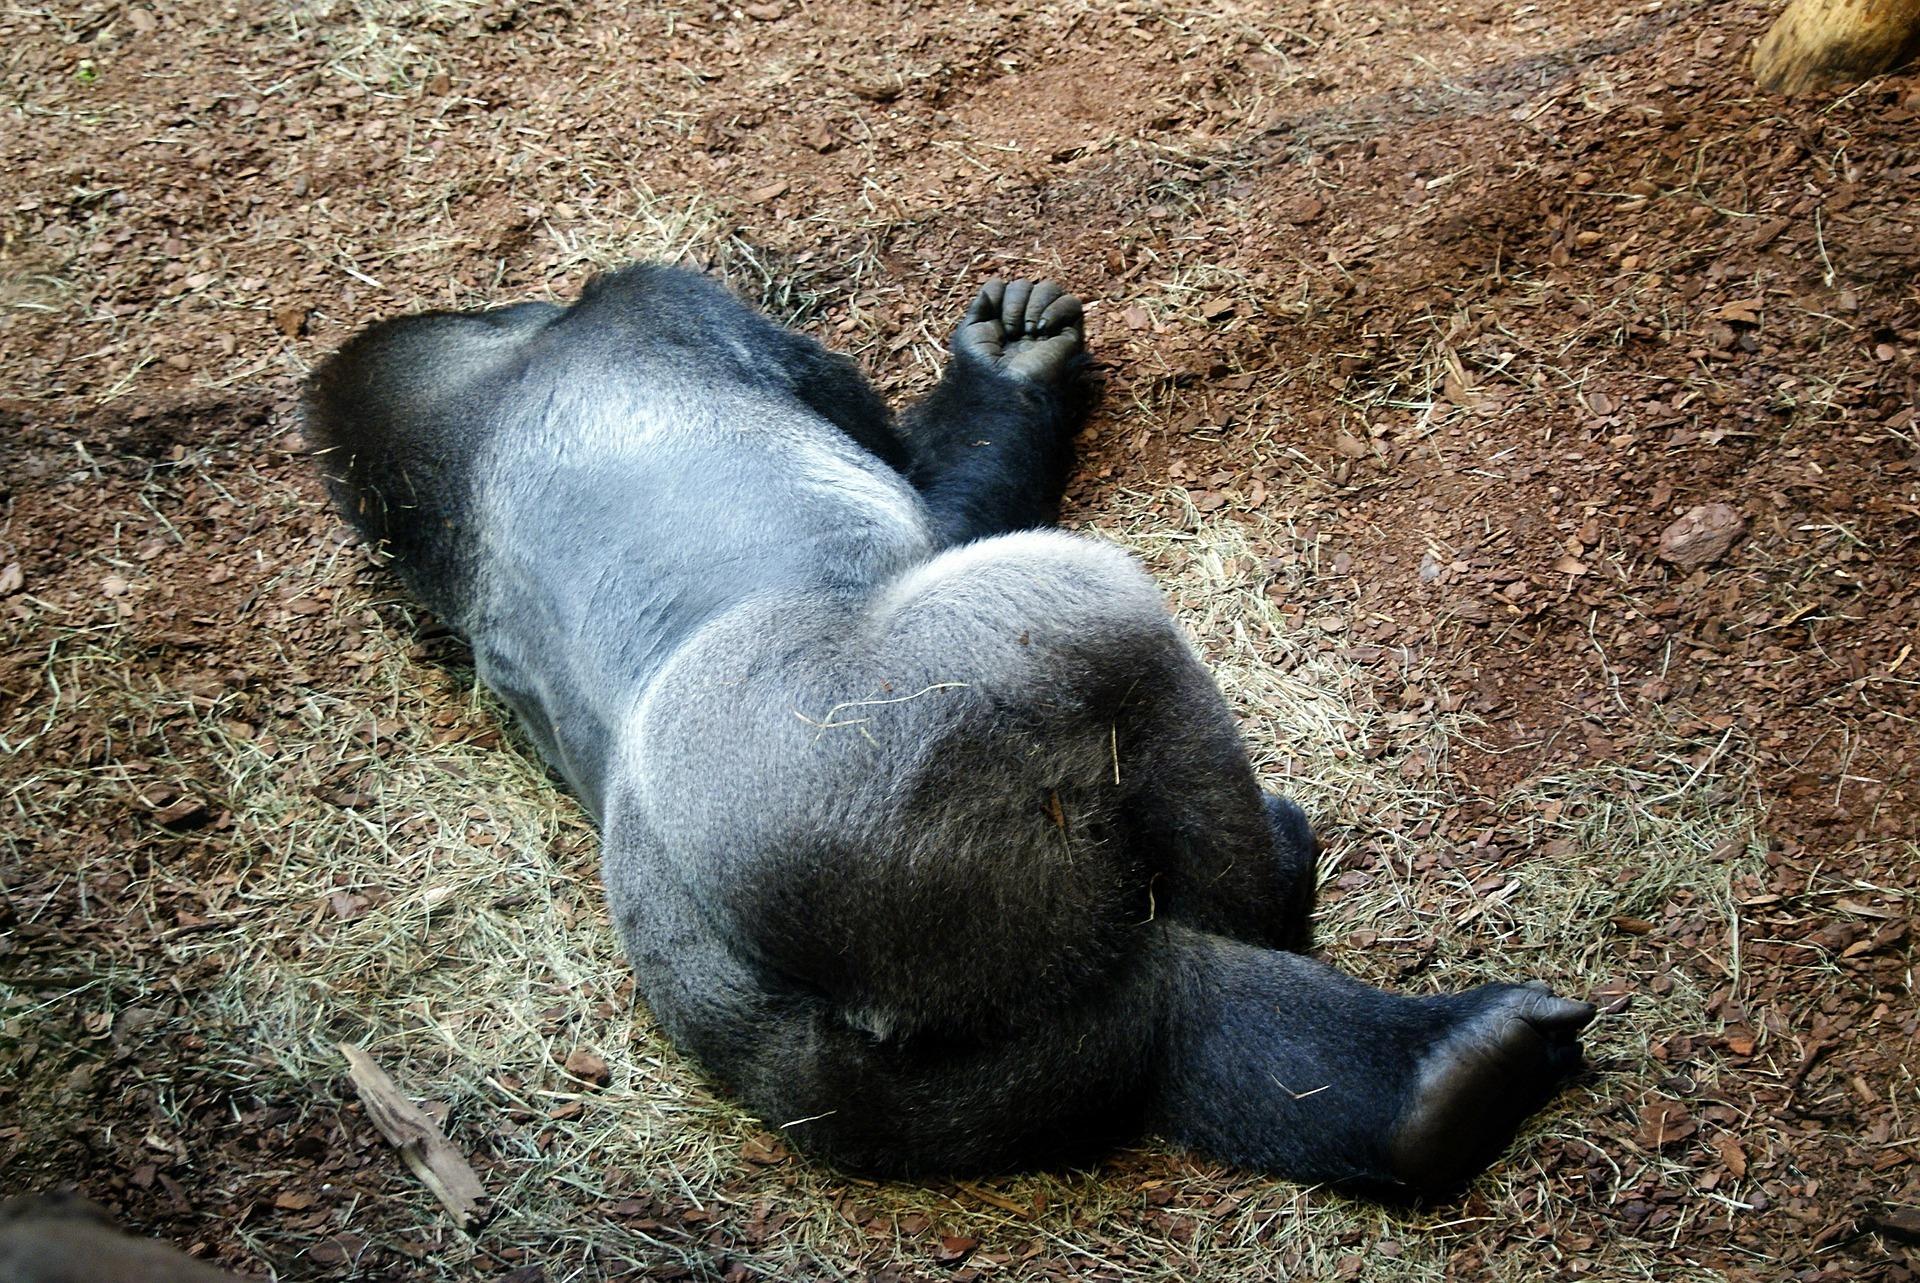 gorilla-368499_1920.jpg